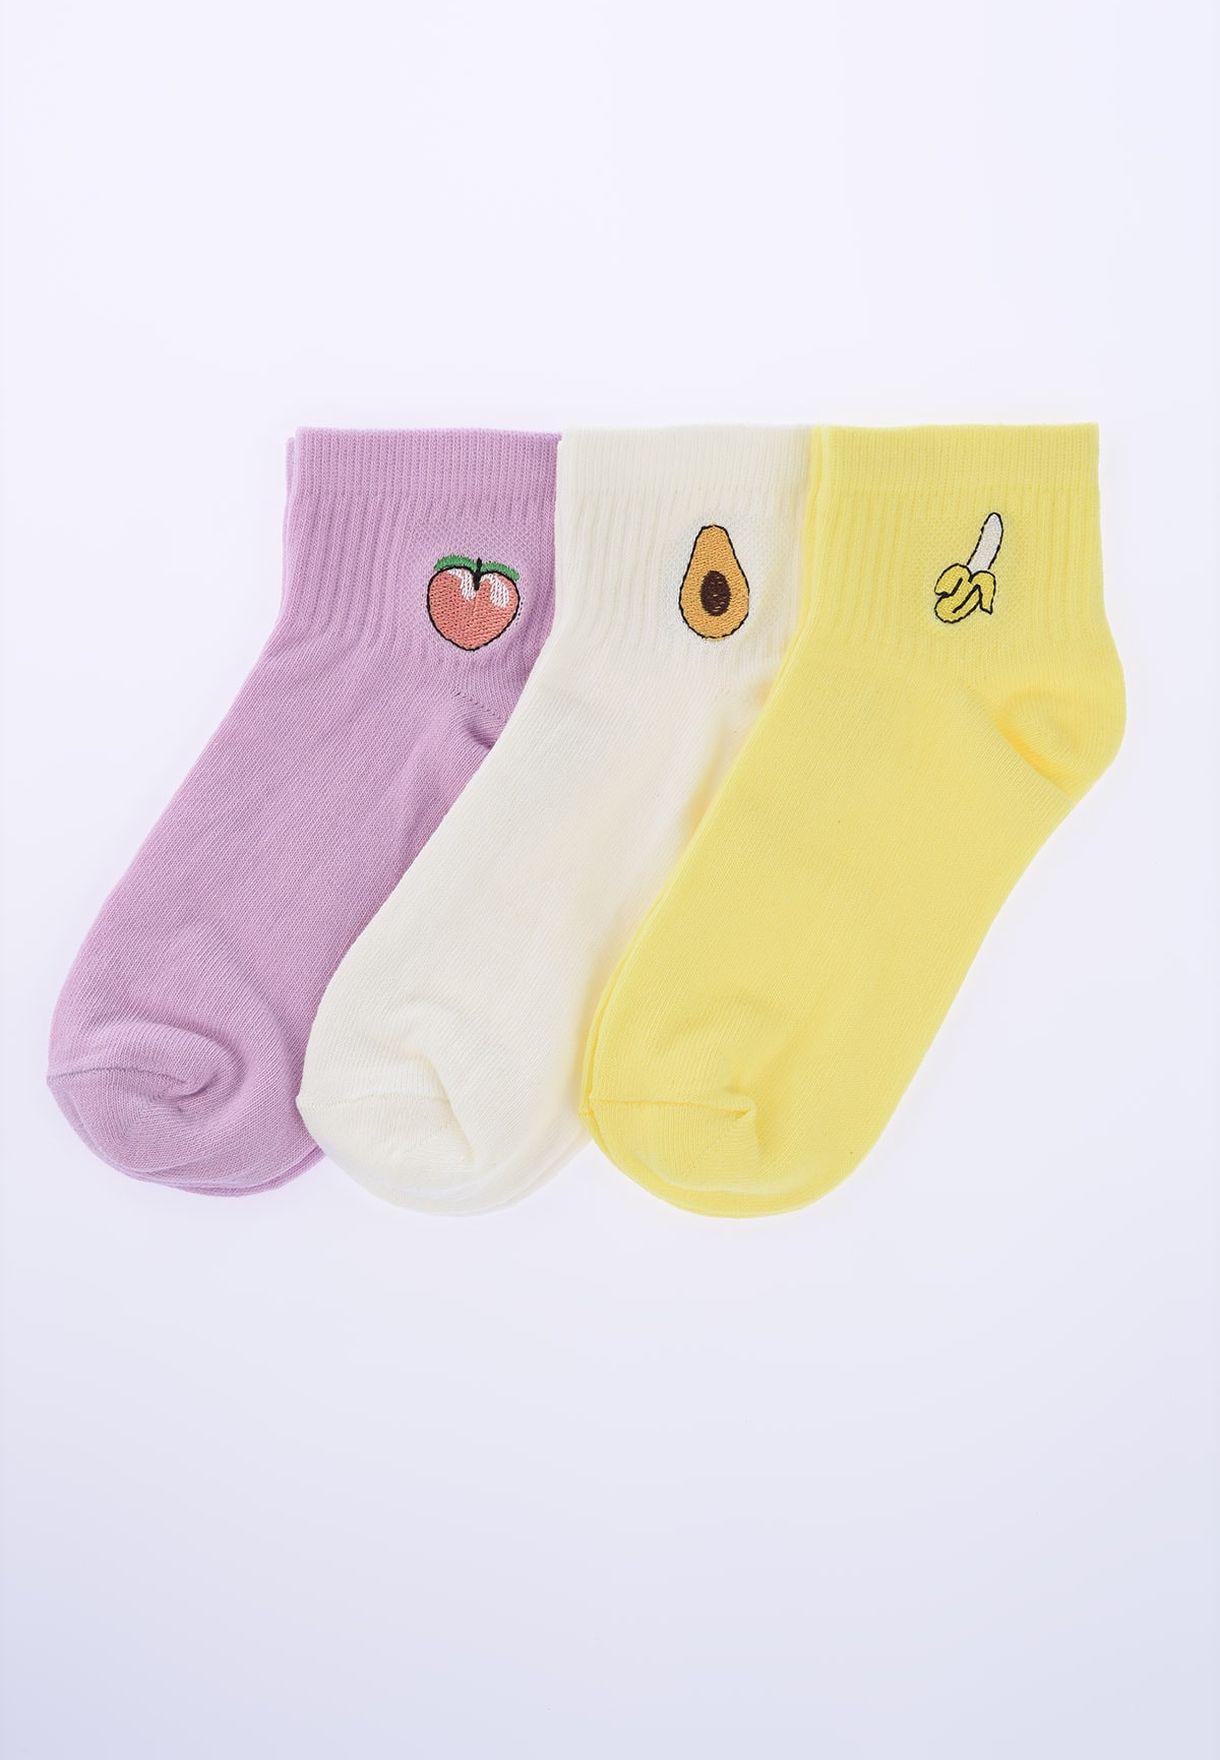 Embroidered Ankle Socks